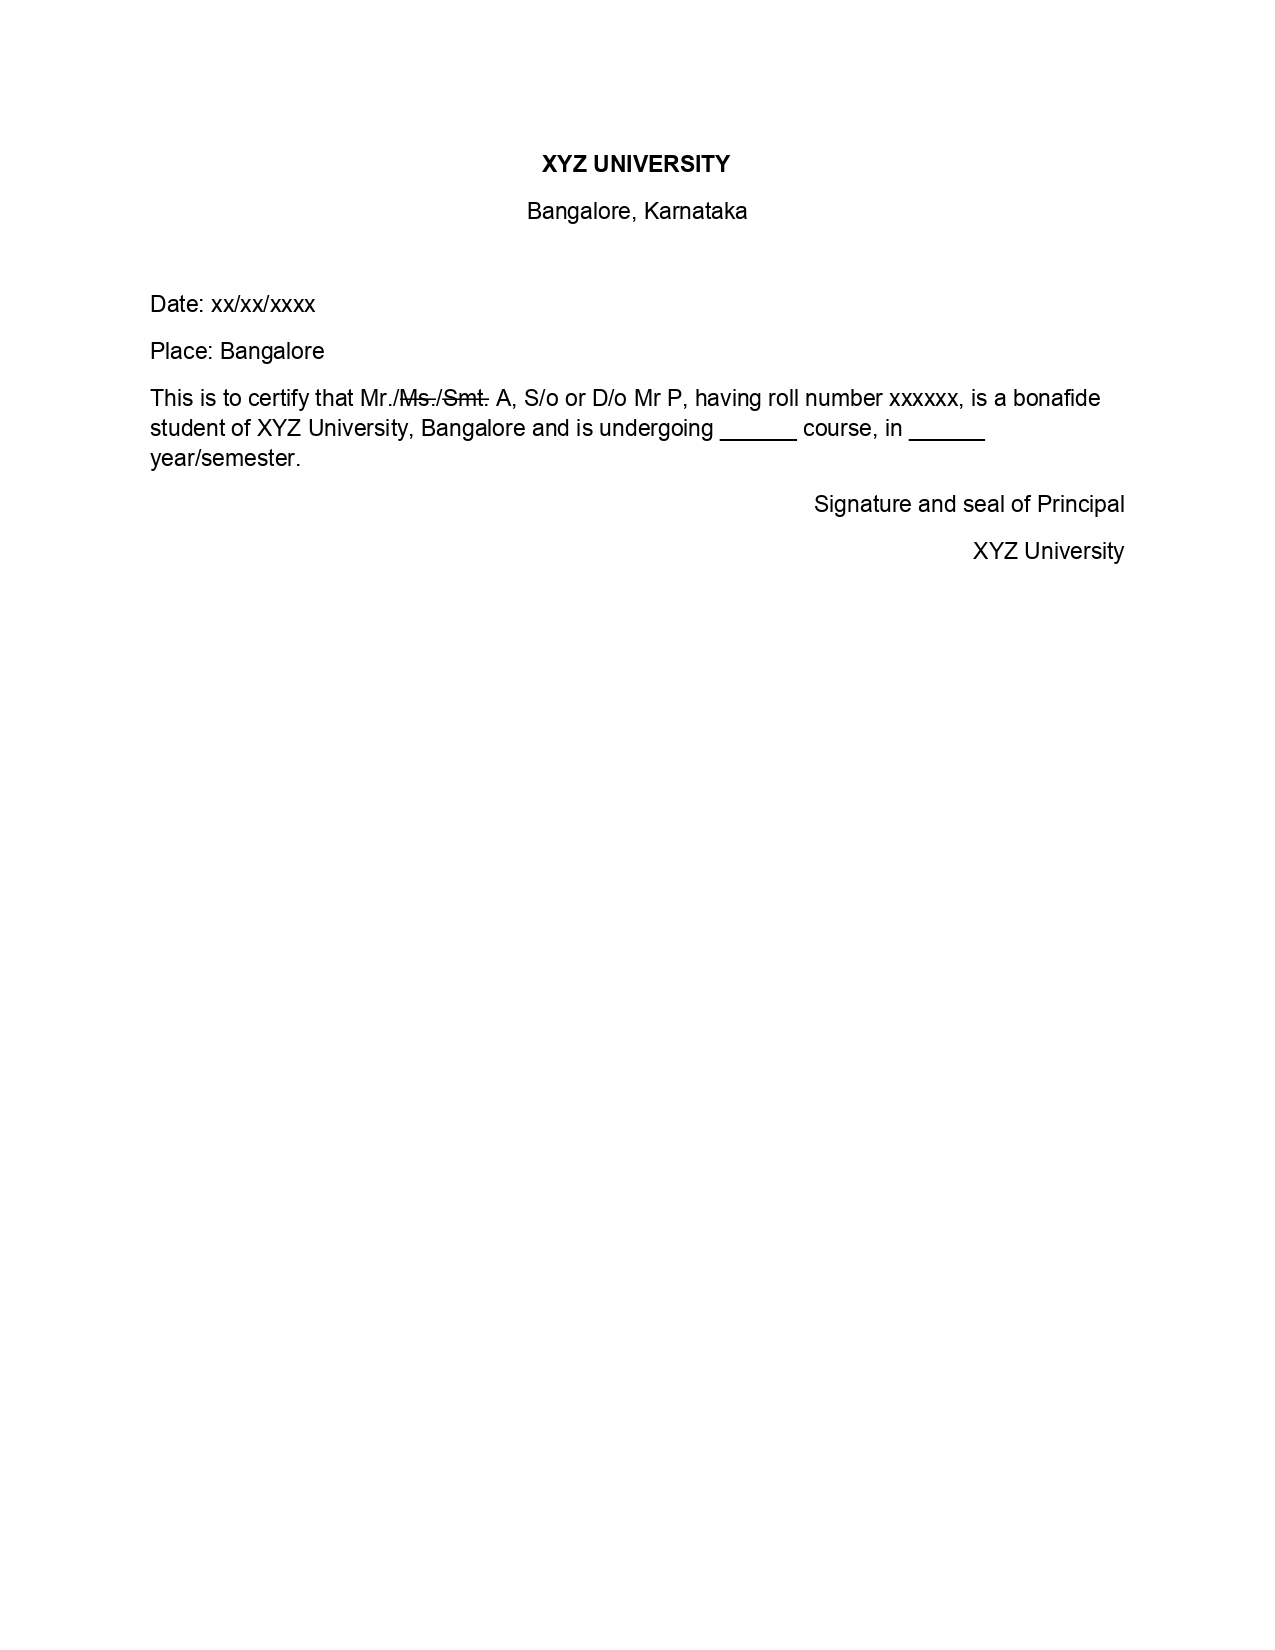 sample bonafide certificate_page-0001